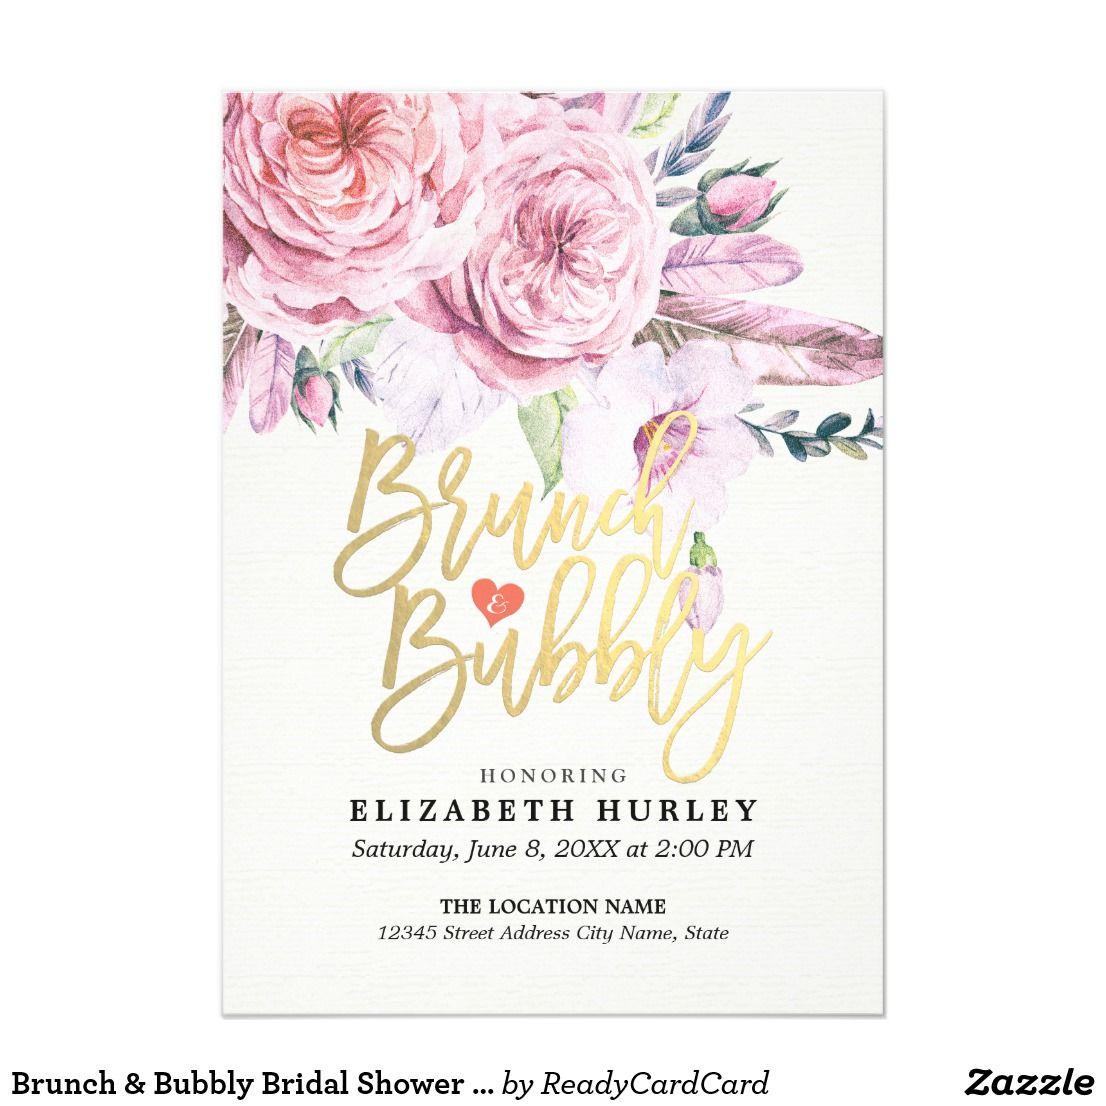 Brunch & Bubbly Bridal Shower Boho Floral Feather